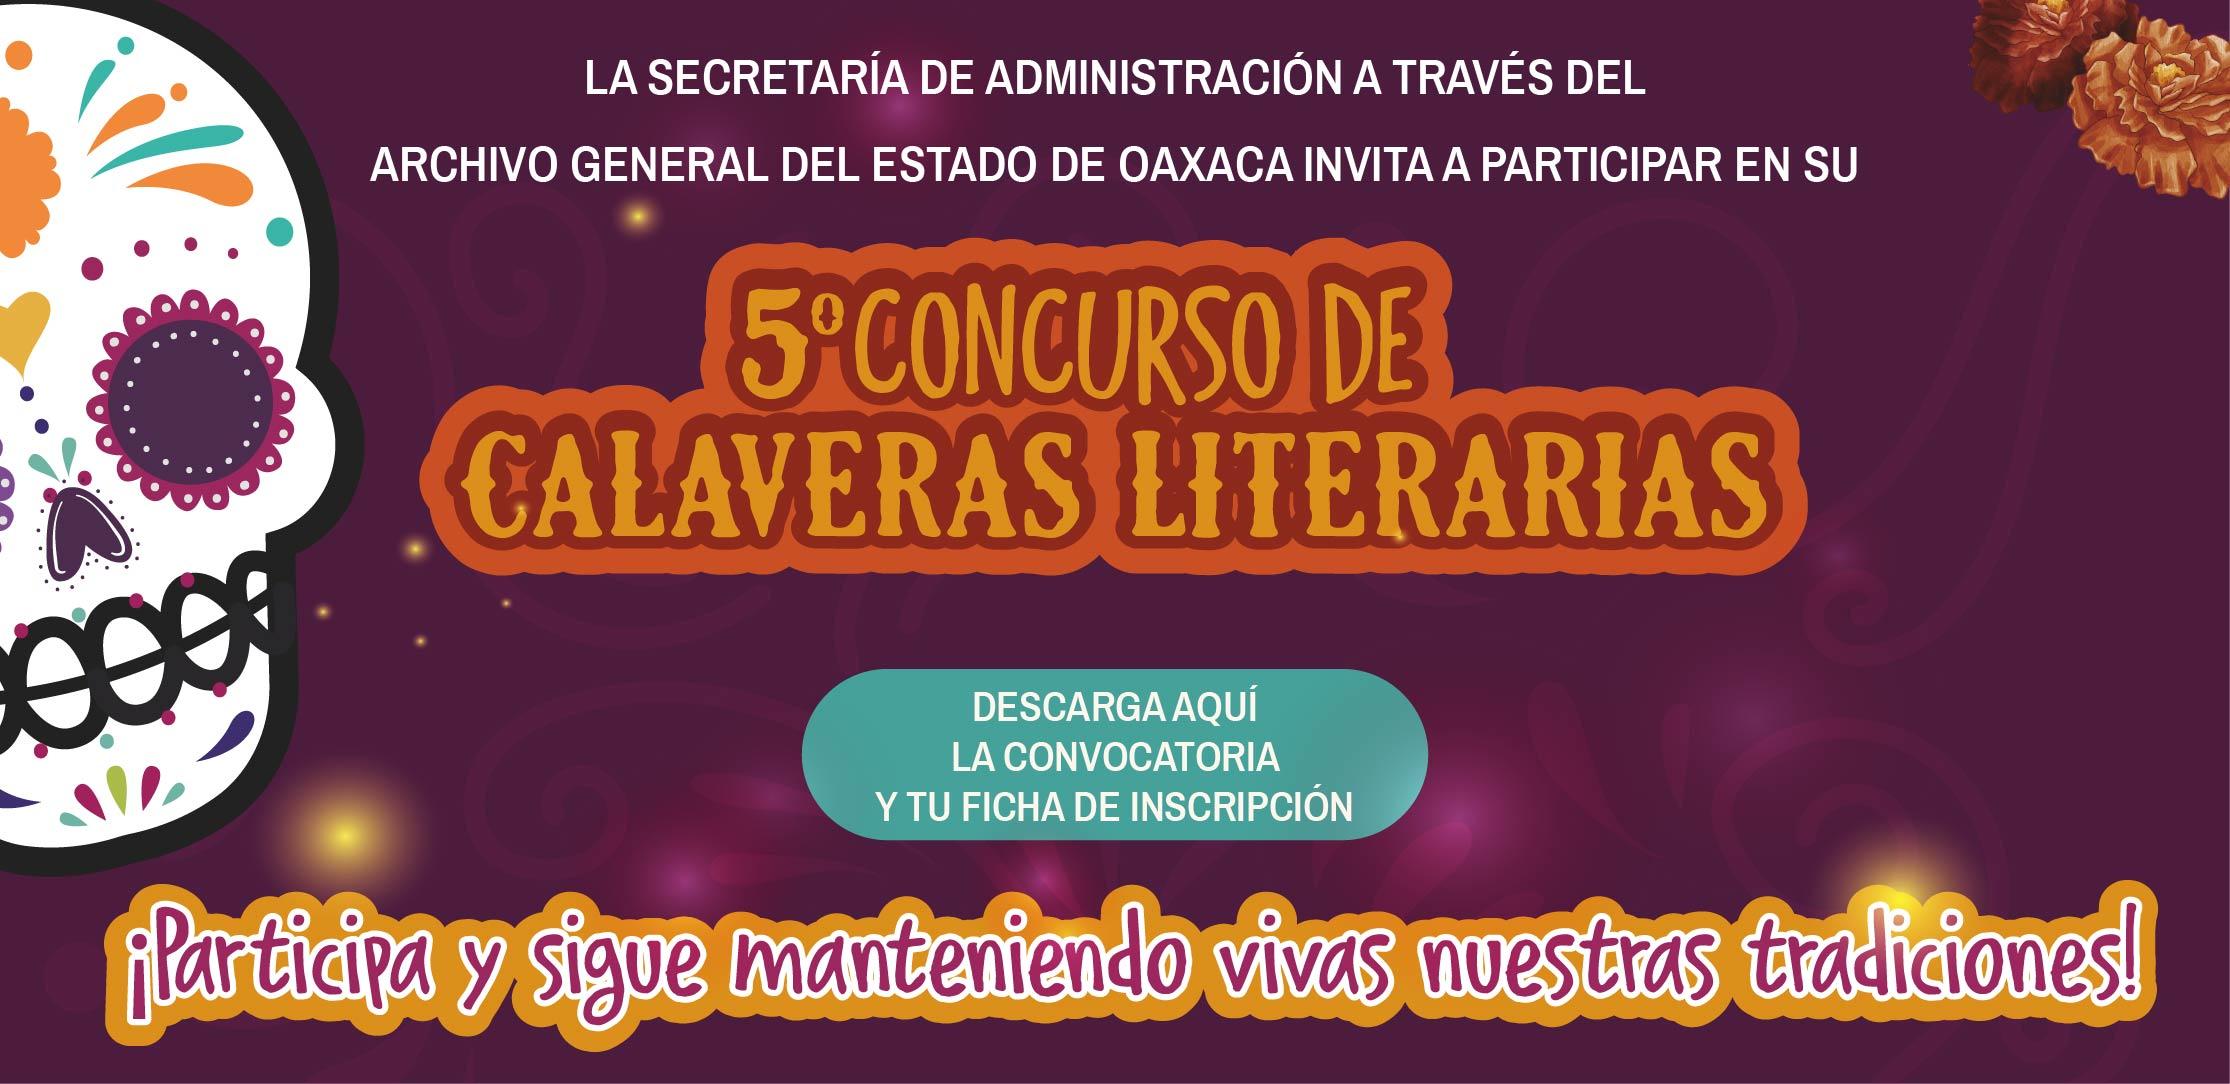 5° Concurso de Calaveras Literarias